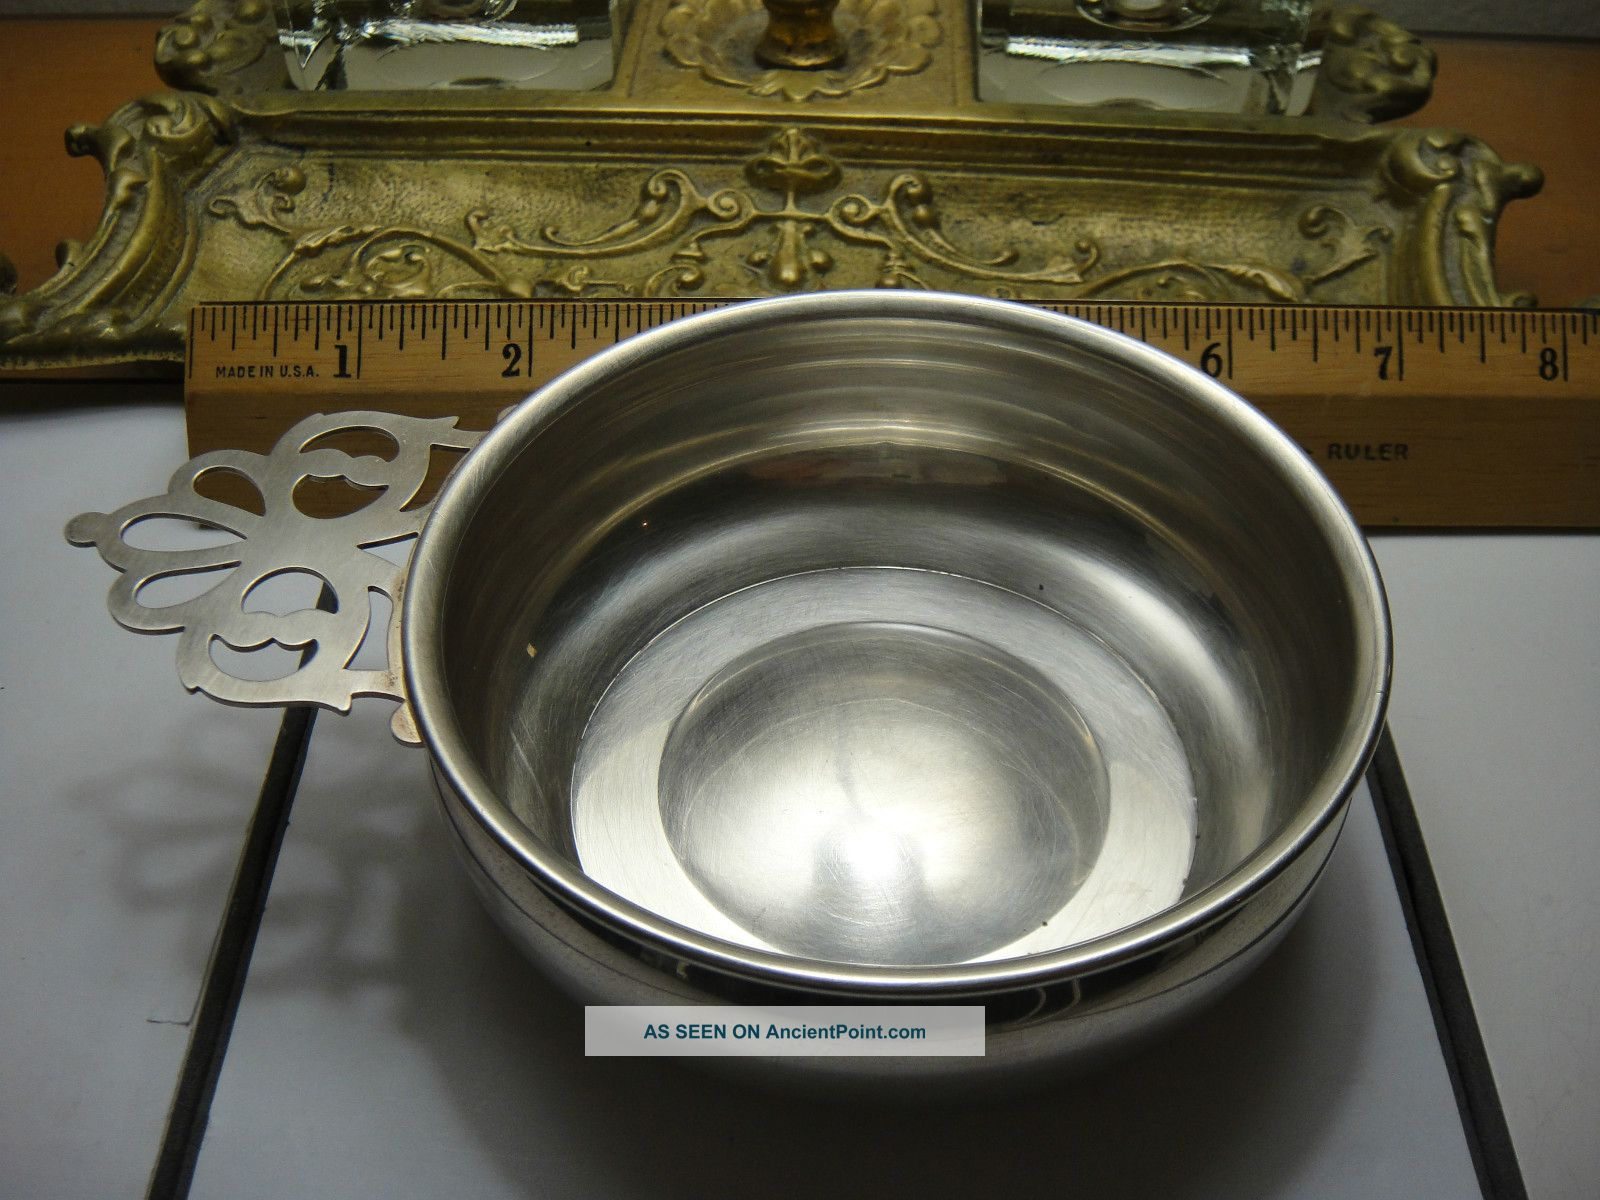 Web Sterling Silver Porringer/wine Taster. Other photo